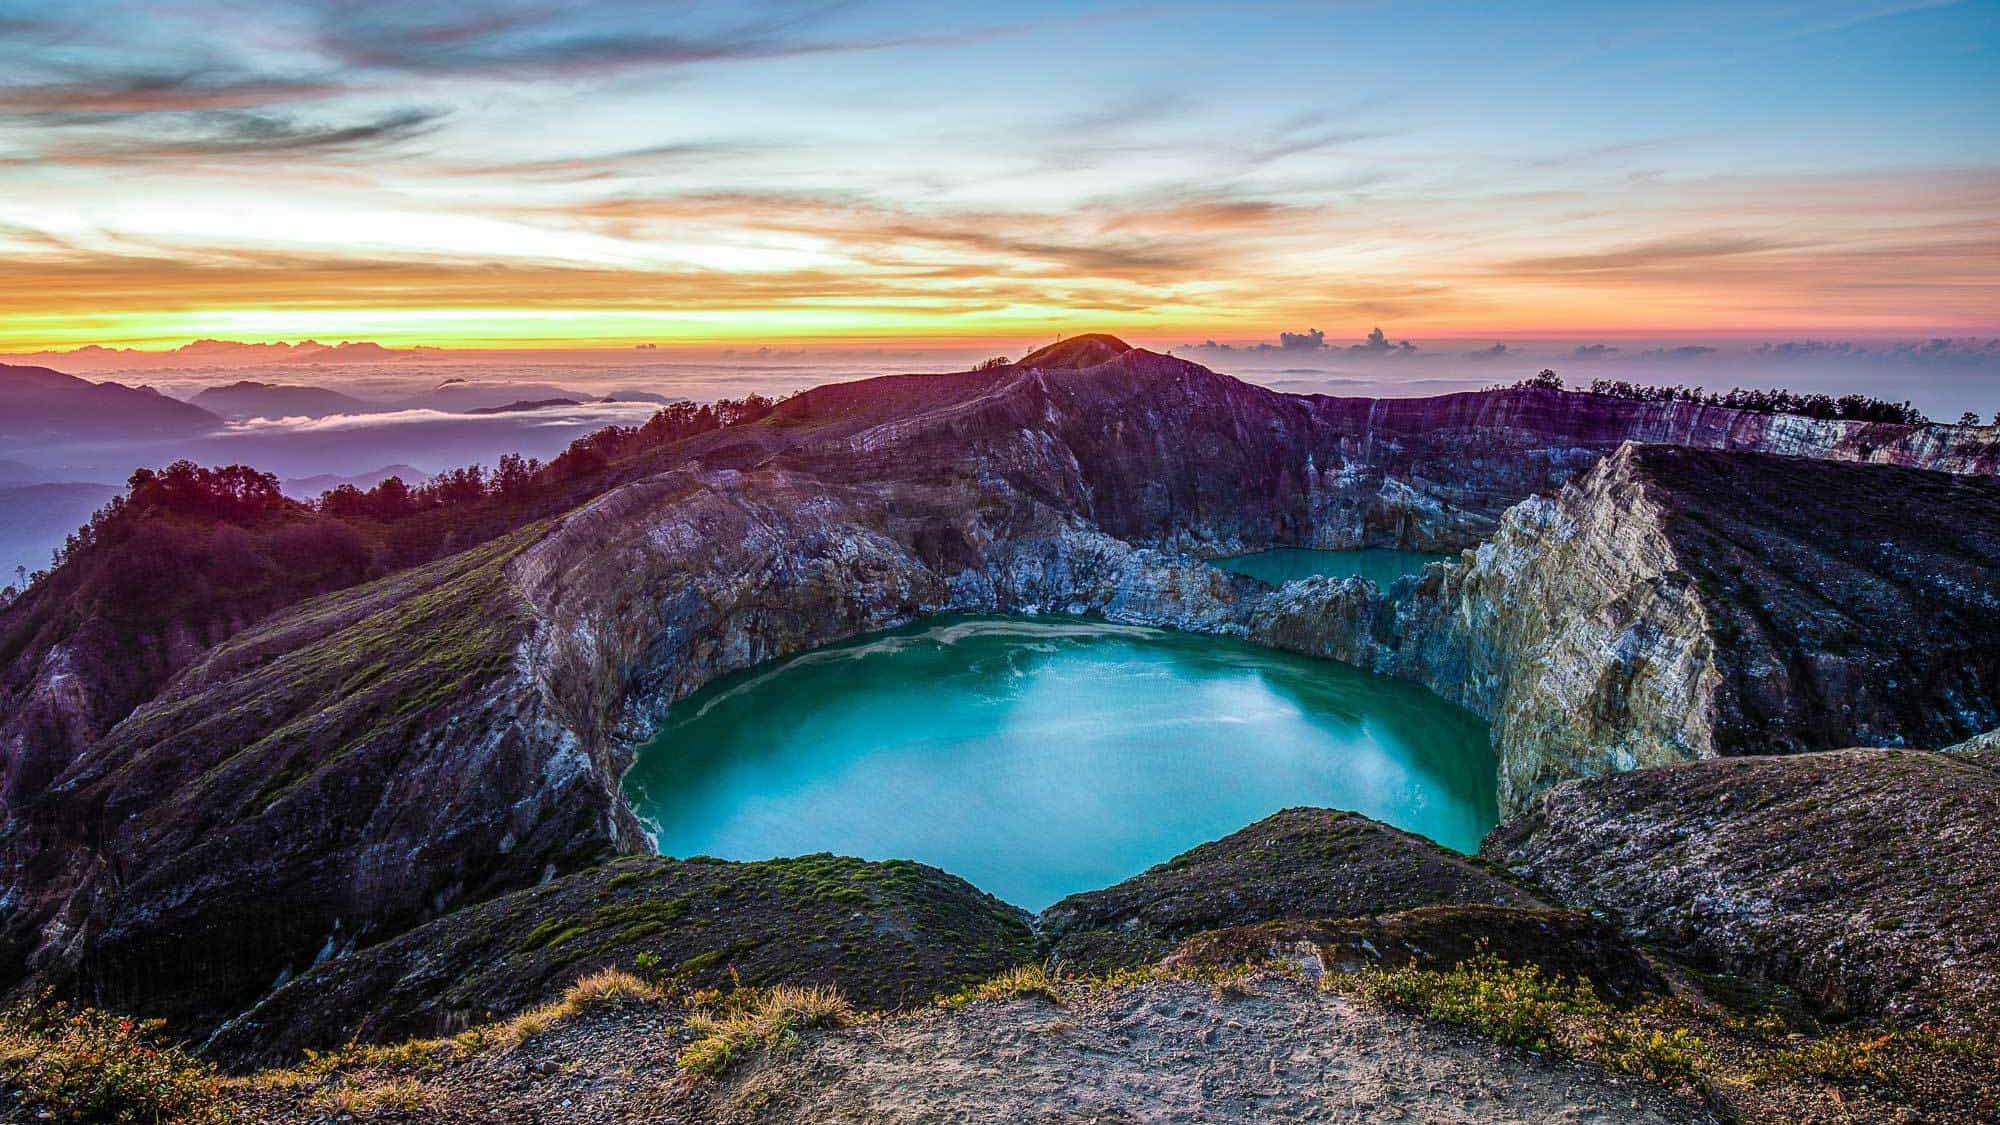 kelimutu-volcano-lake-flores-indonesia-sunset.jpg